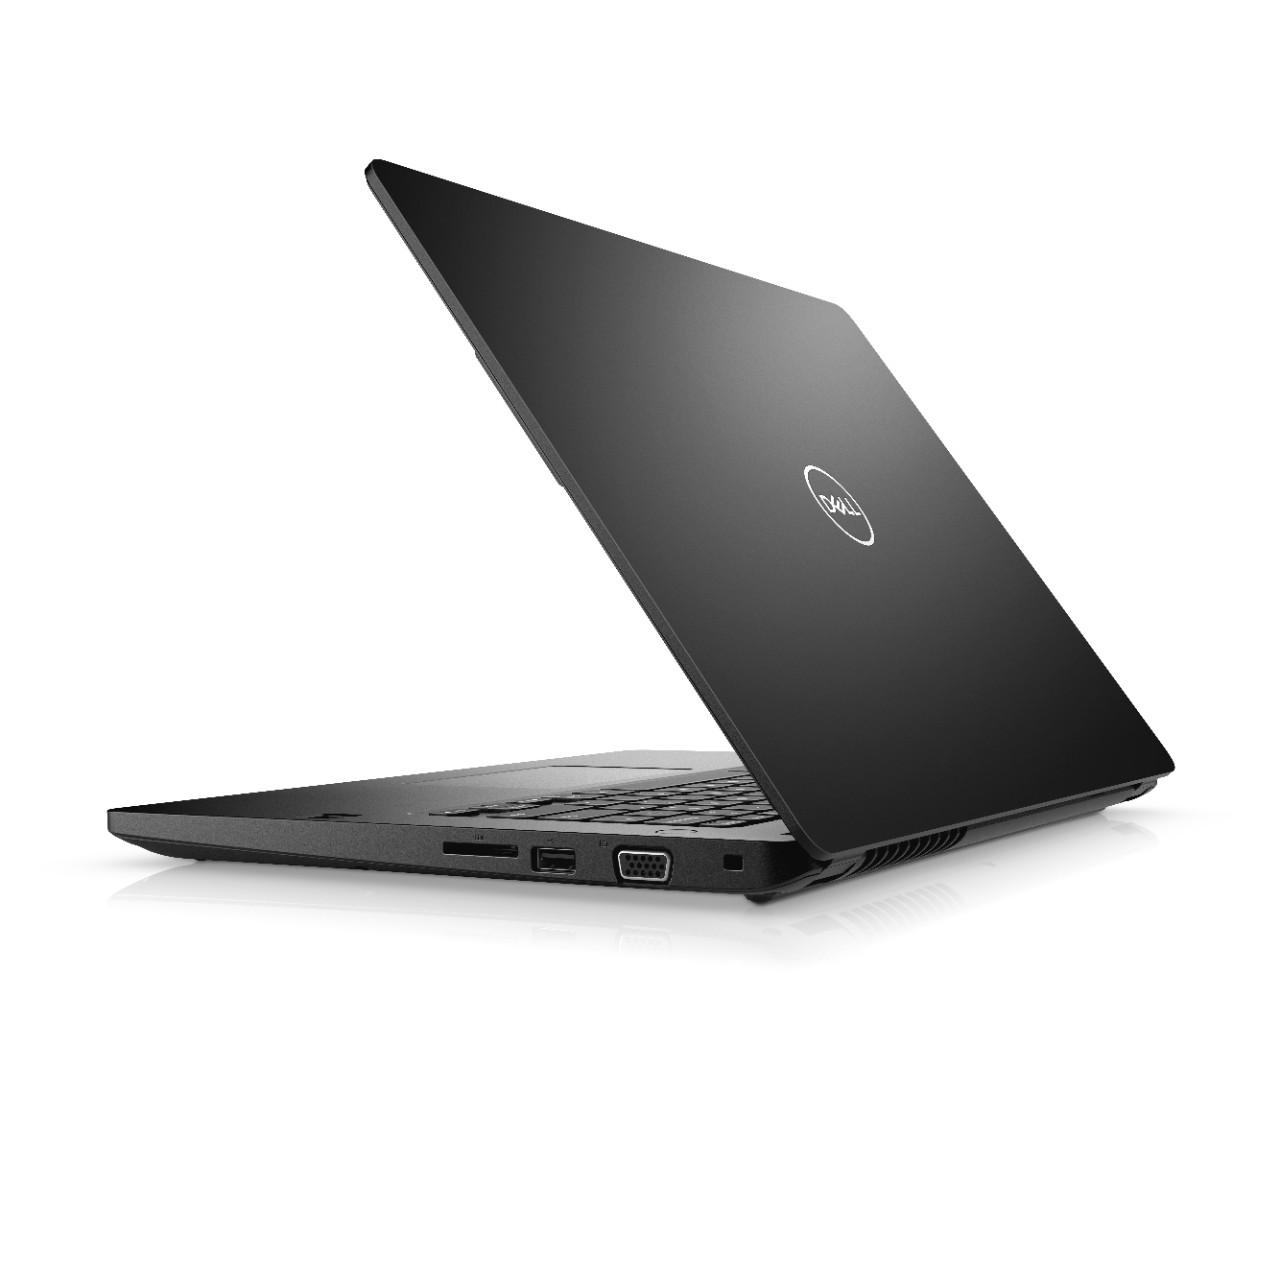 "Dell Latitude 3480 14"" HD i5-7200U/8GB/256GB SSD/FPR/MCR/VGA/HDMI/W10P/3RNBD/Černý"